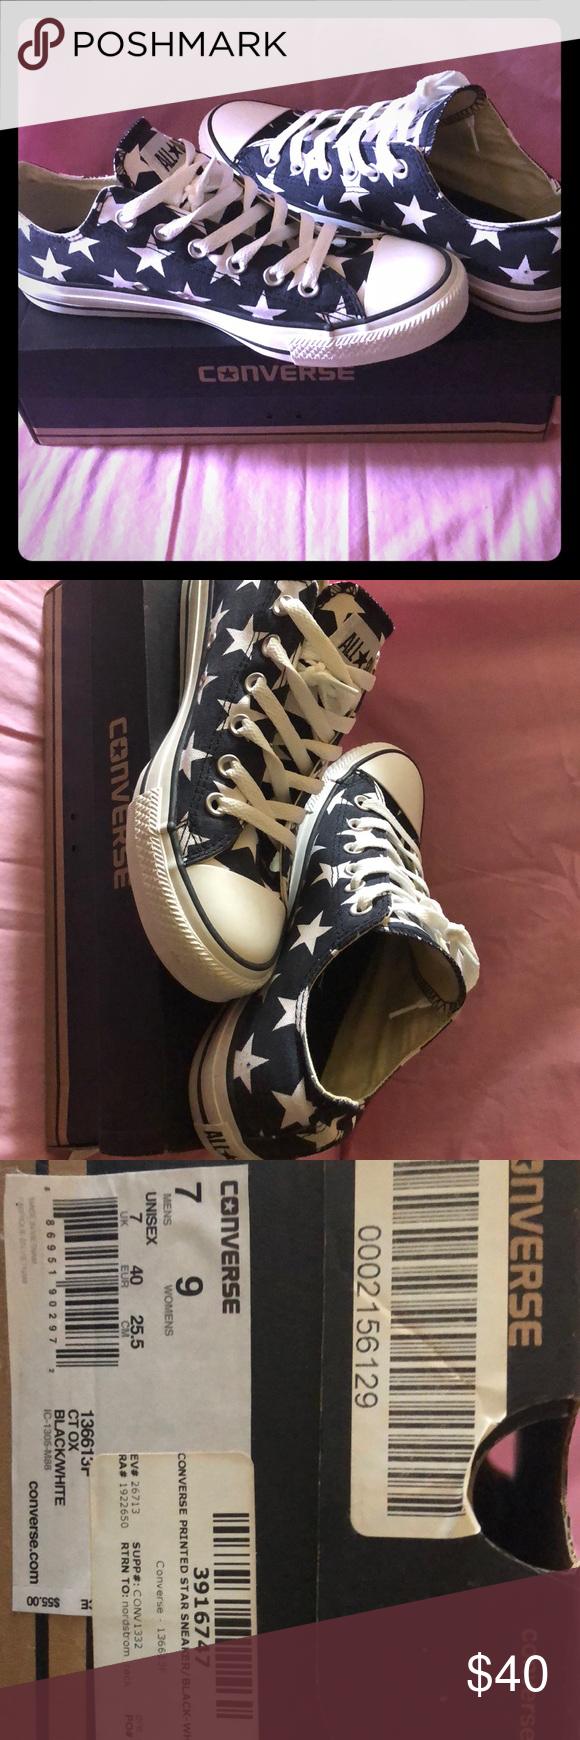 Converse Sneakers Converse sneakers, Sneaker boutique